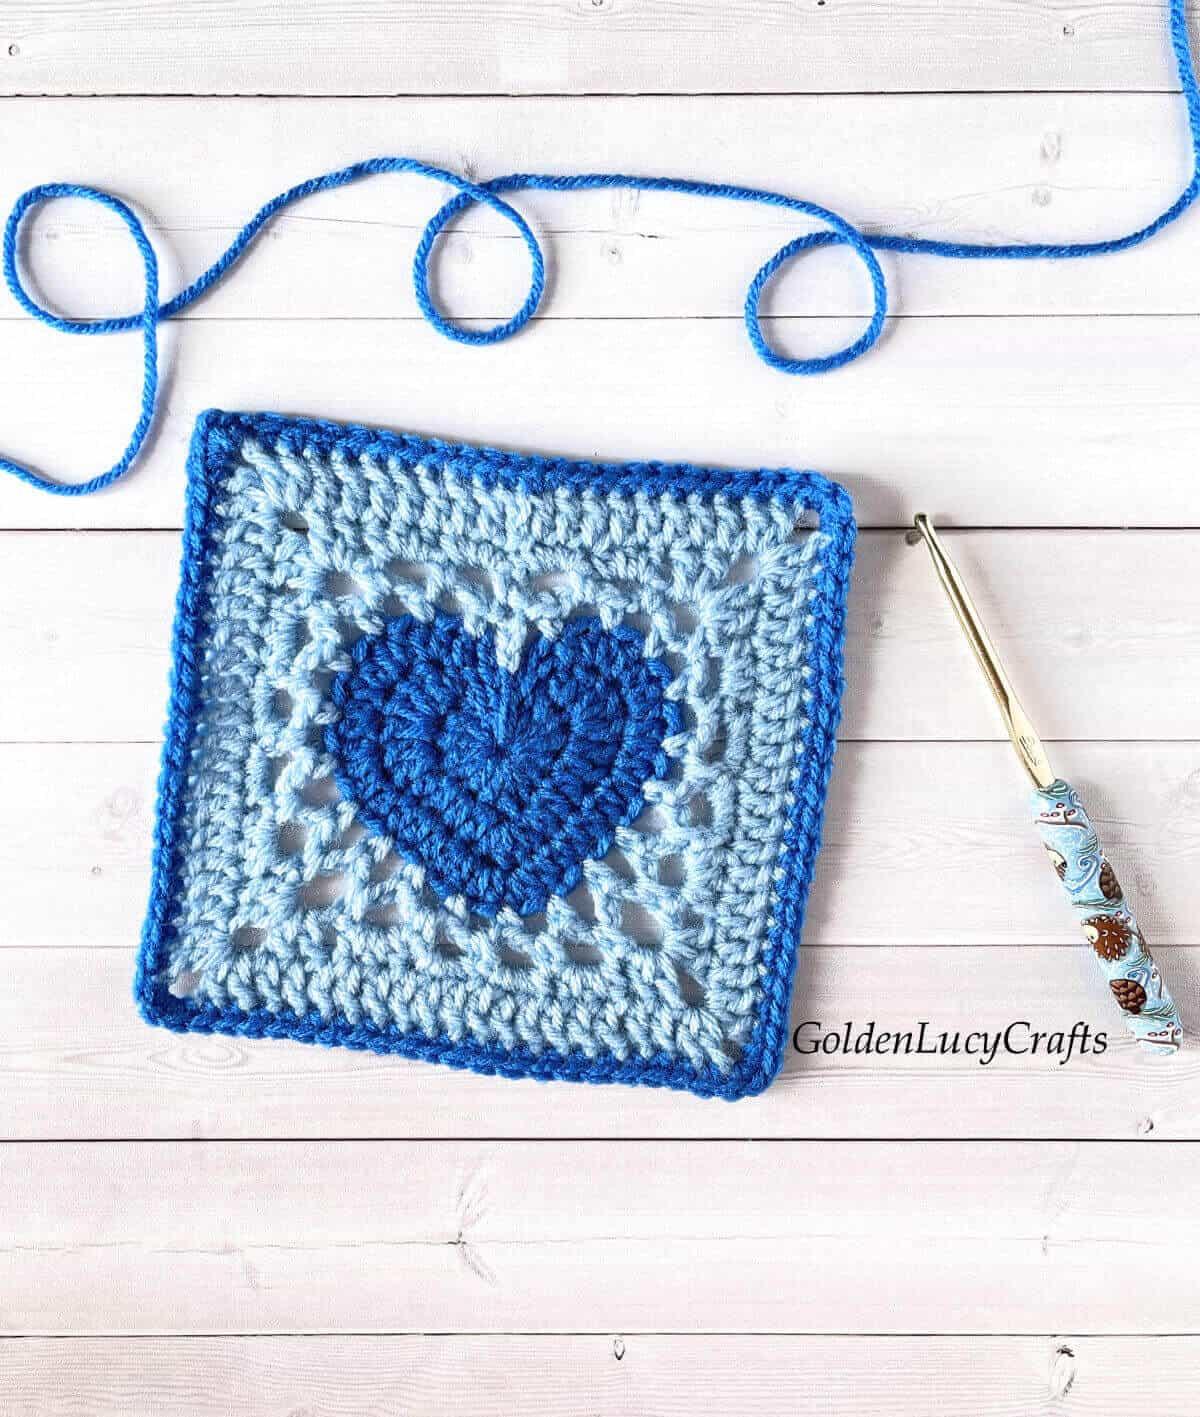 Blue crochet heart granny square, crochet hook and blue yarn.